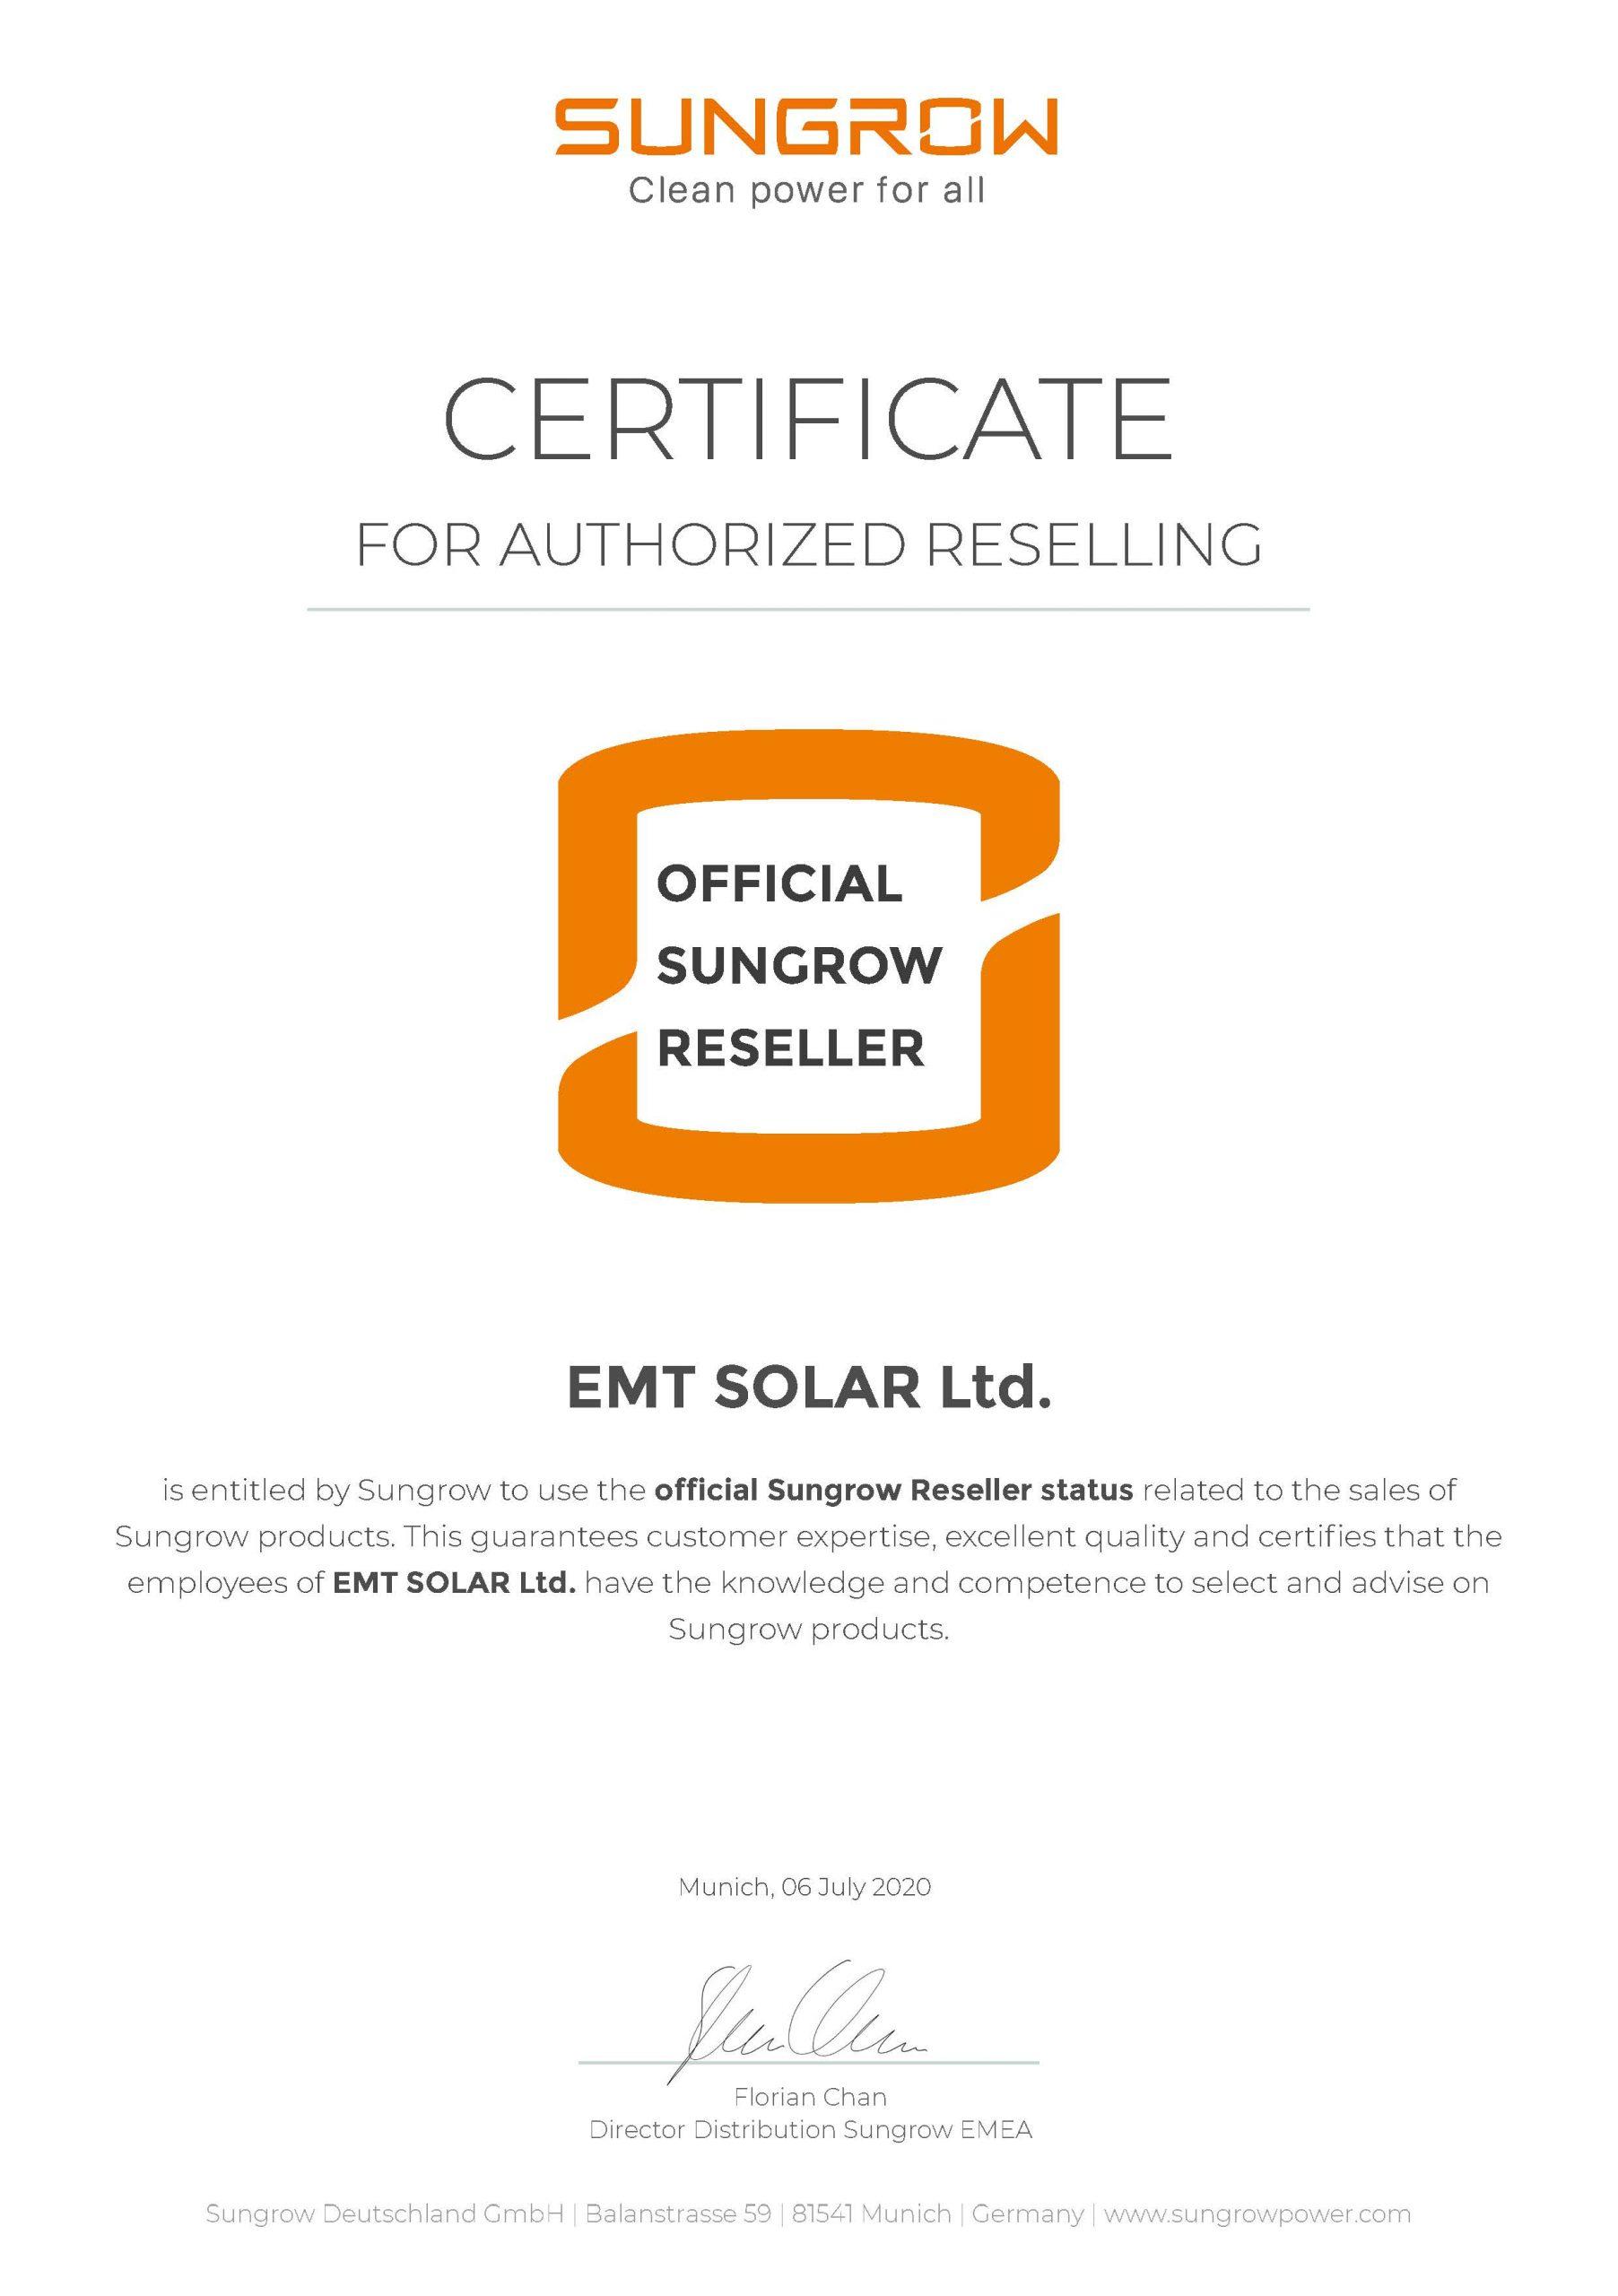 EMT SOLAR reseler